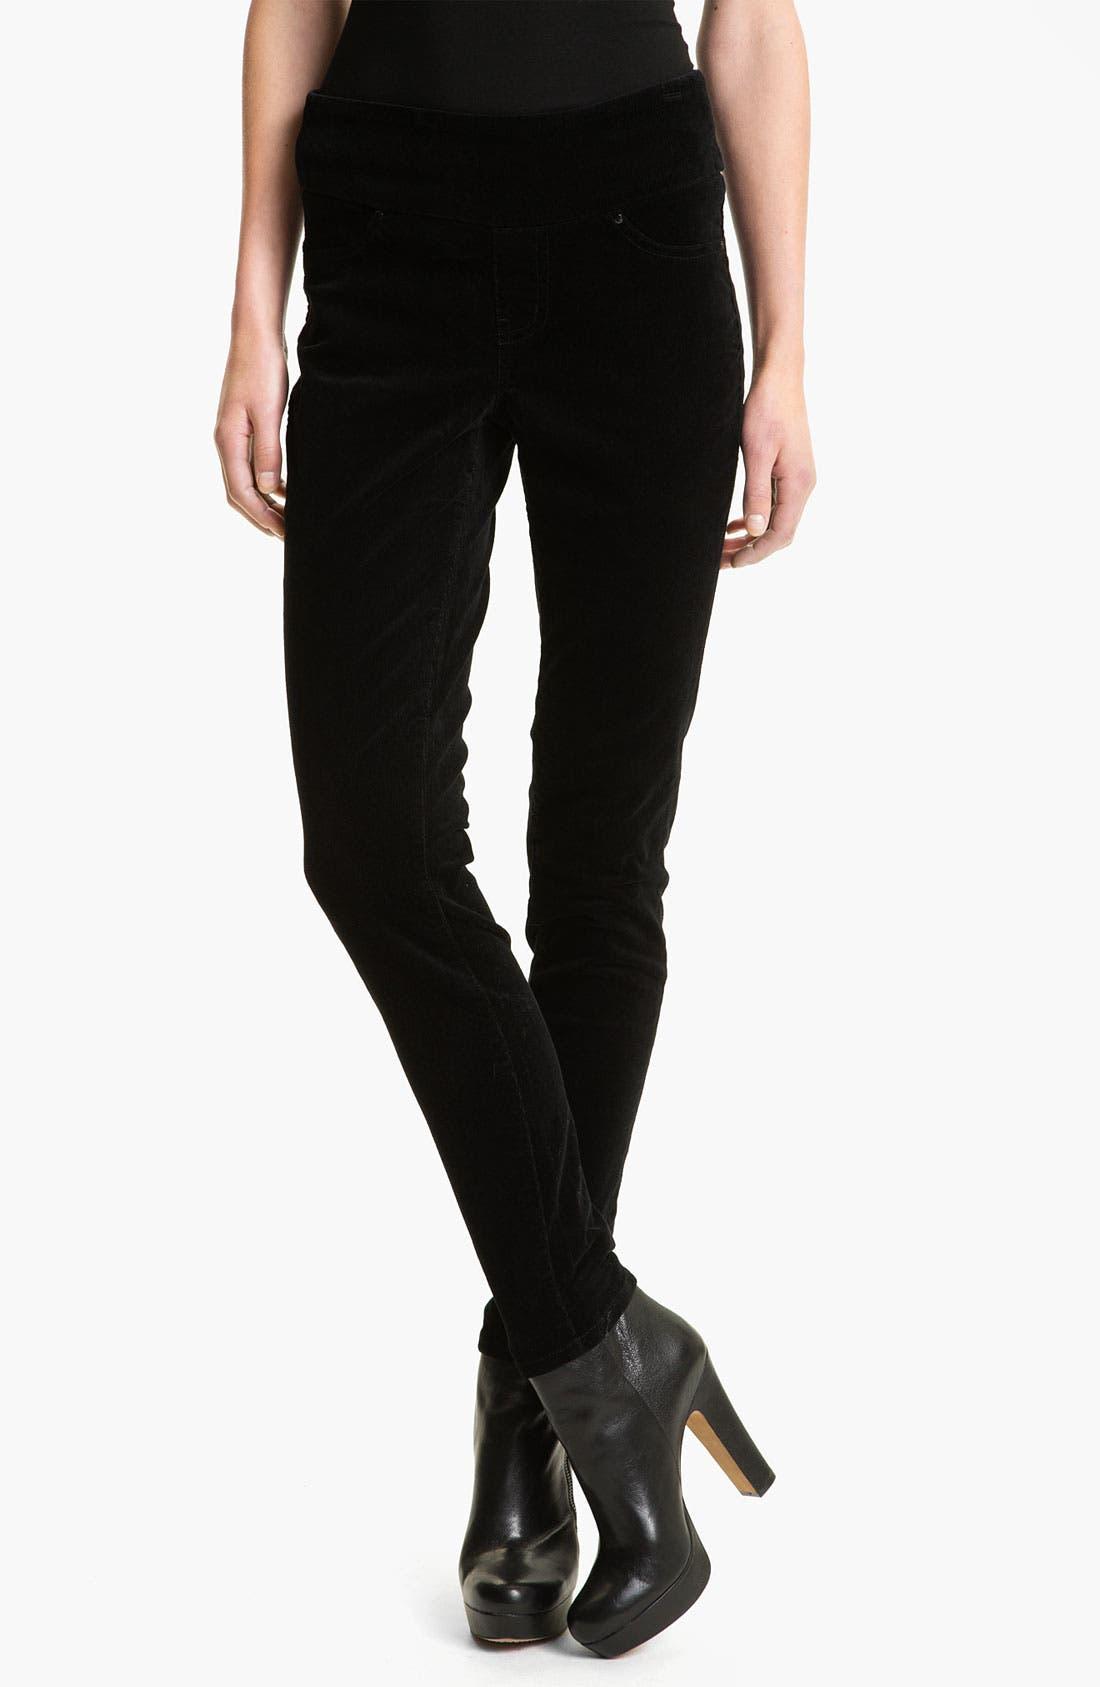 Alternate Image 1 Selected - Jag Jeans 'Nikki' Corduroy Leggings (Petite)